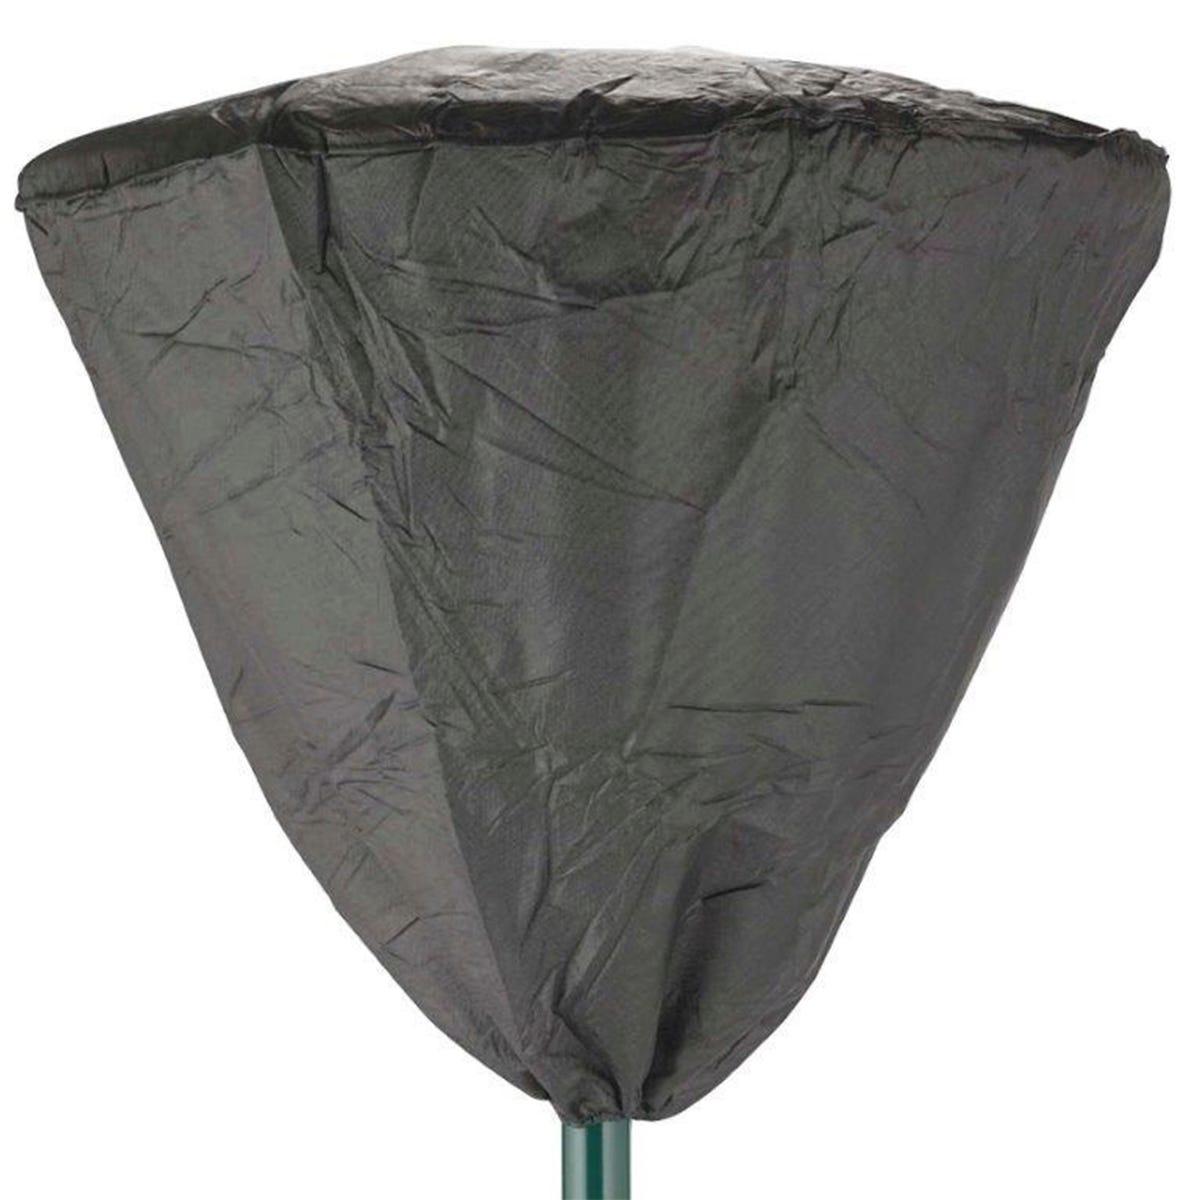 Lifestyle Appliances Patio Heater Head Cover - Black